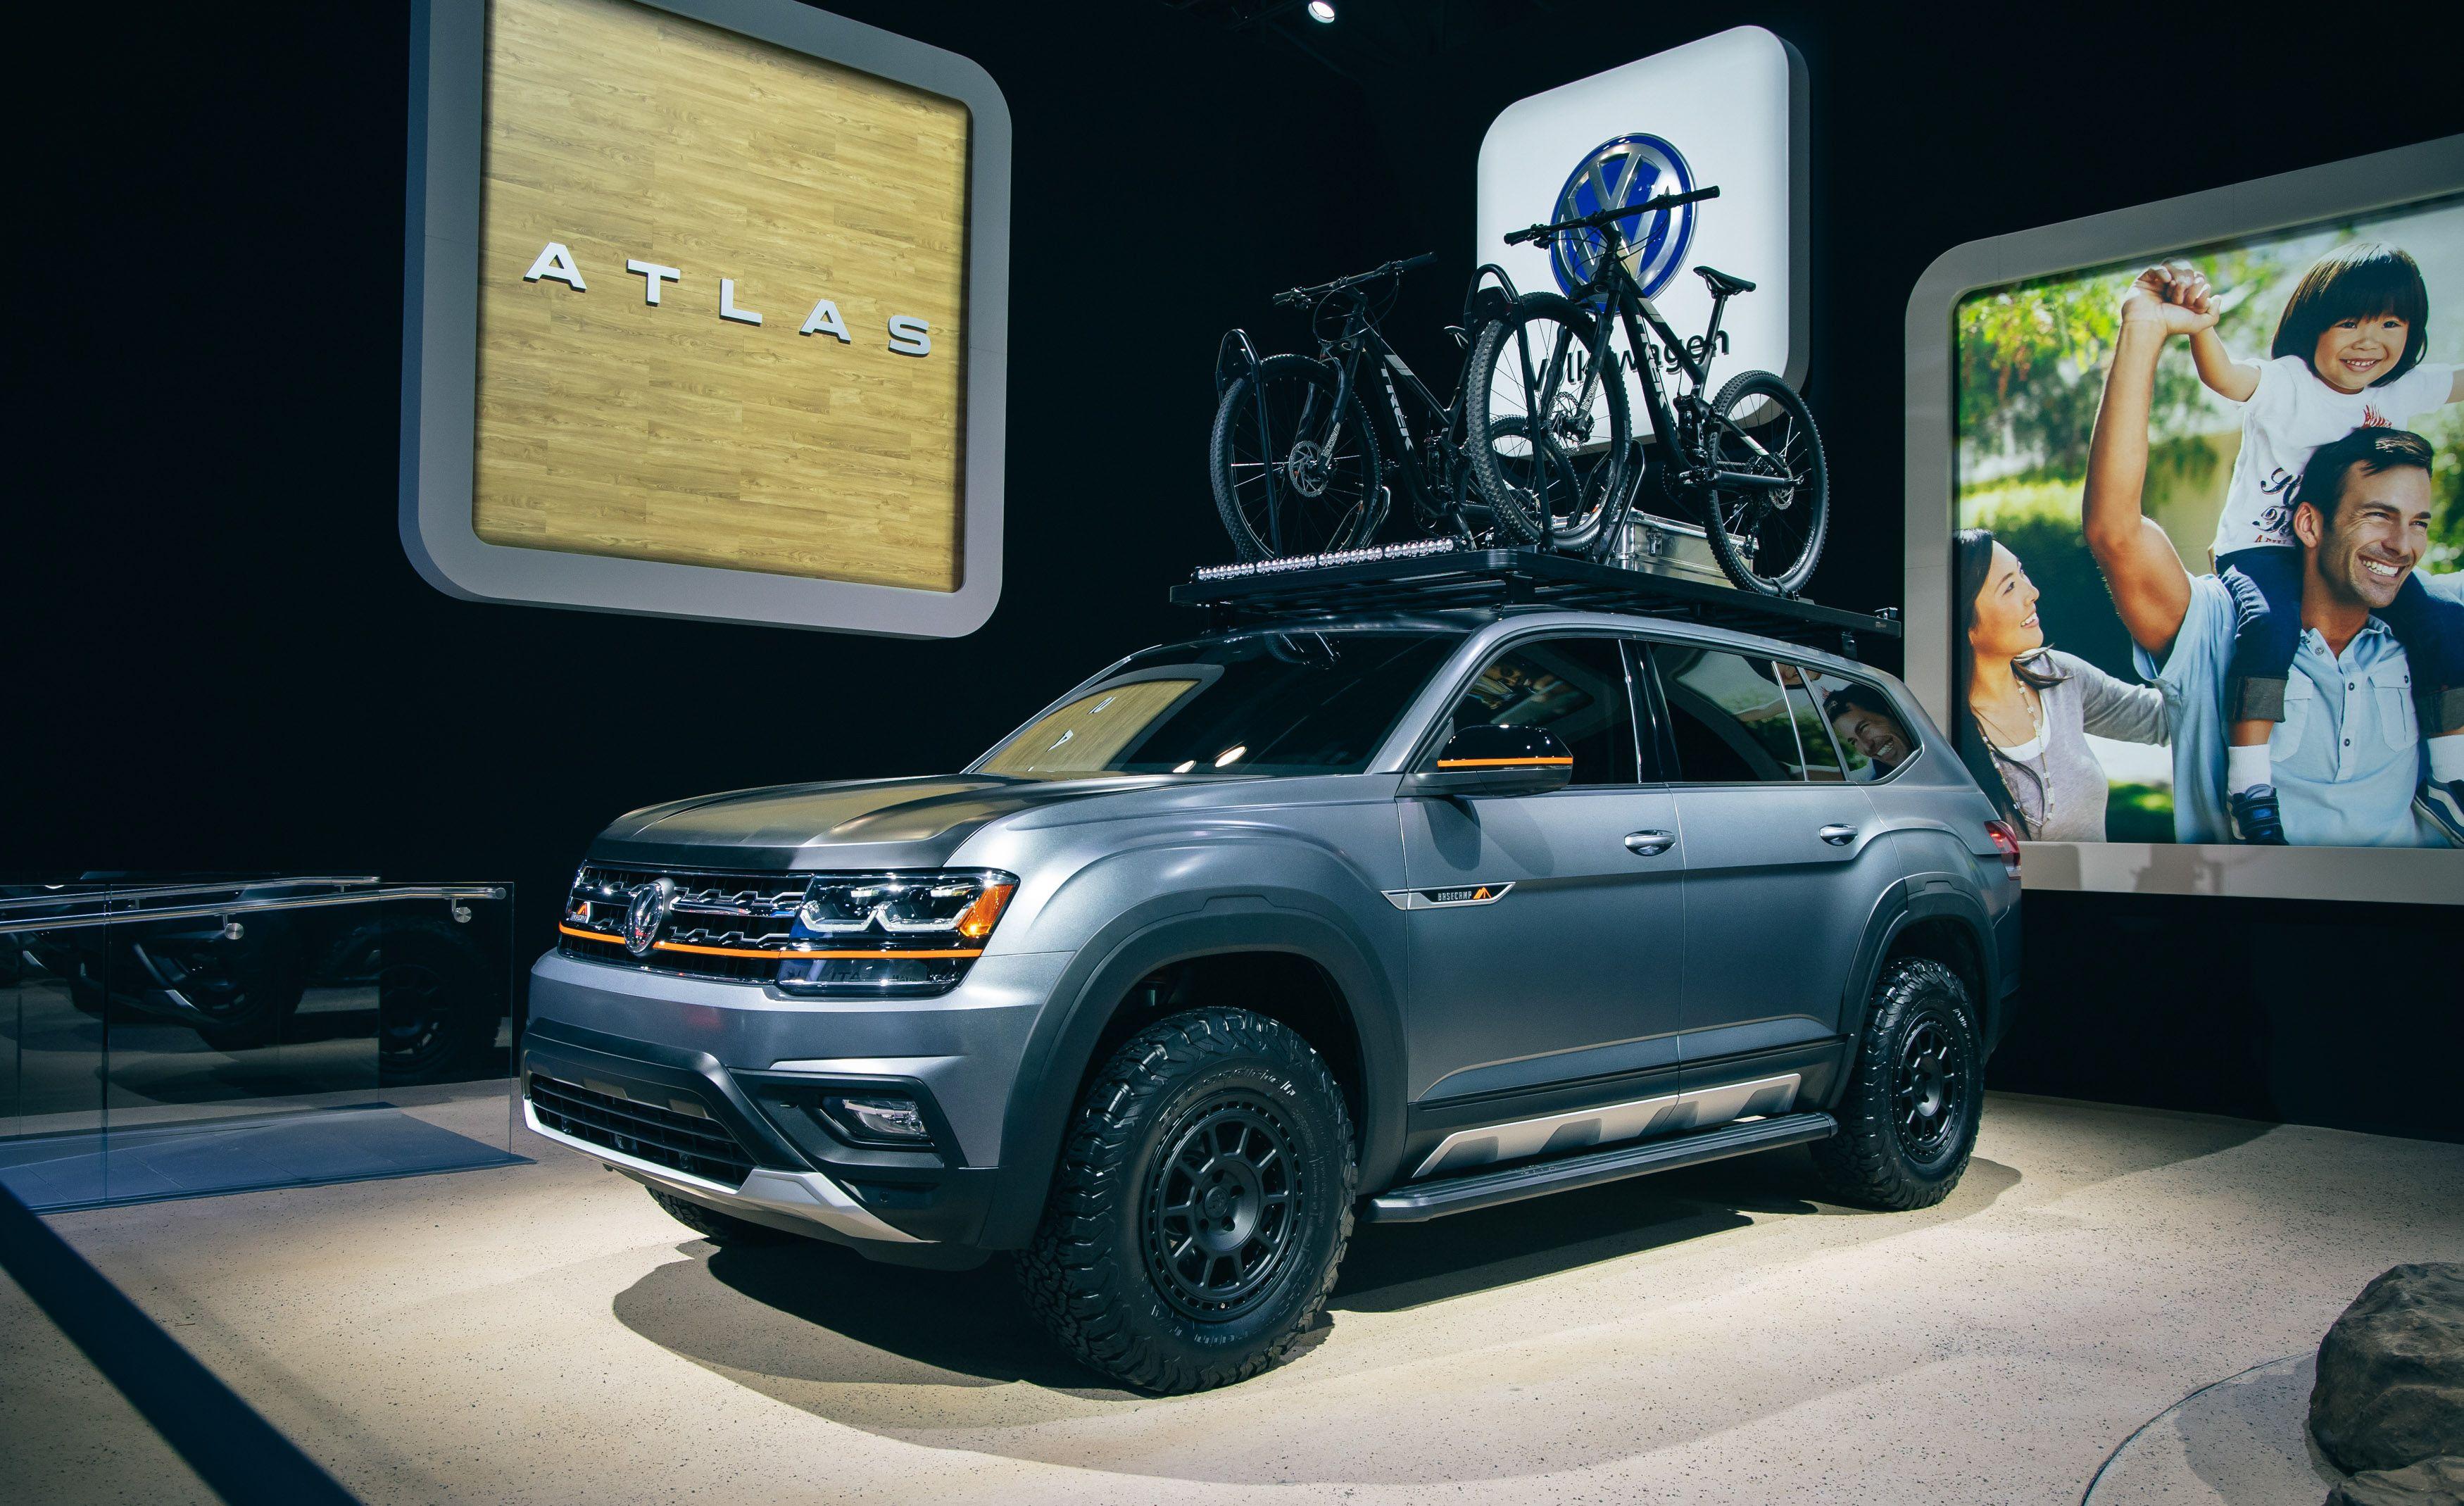 Volkswagen Atlas Basecamp Off Road Version Of Vw S Big Suv